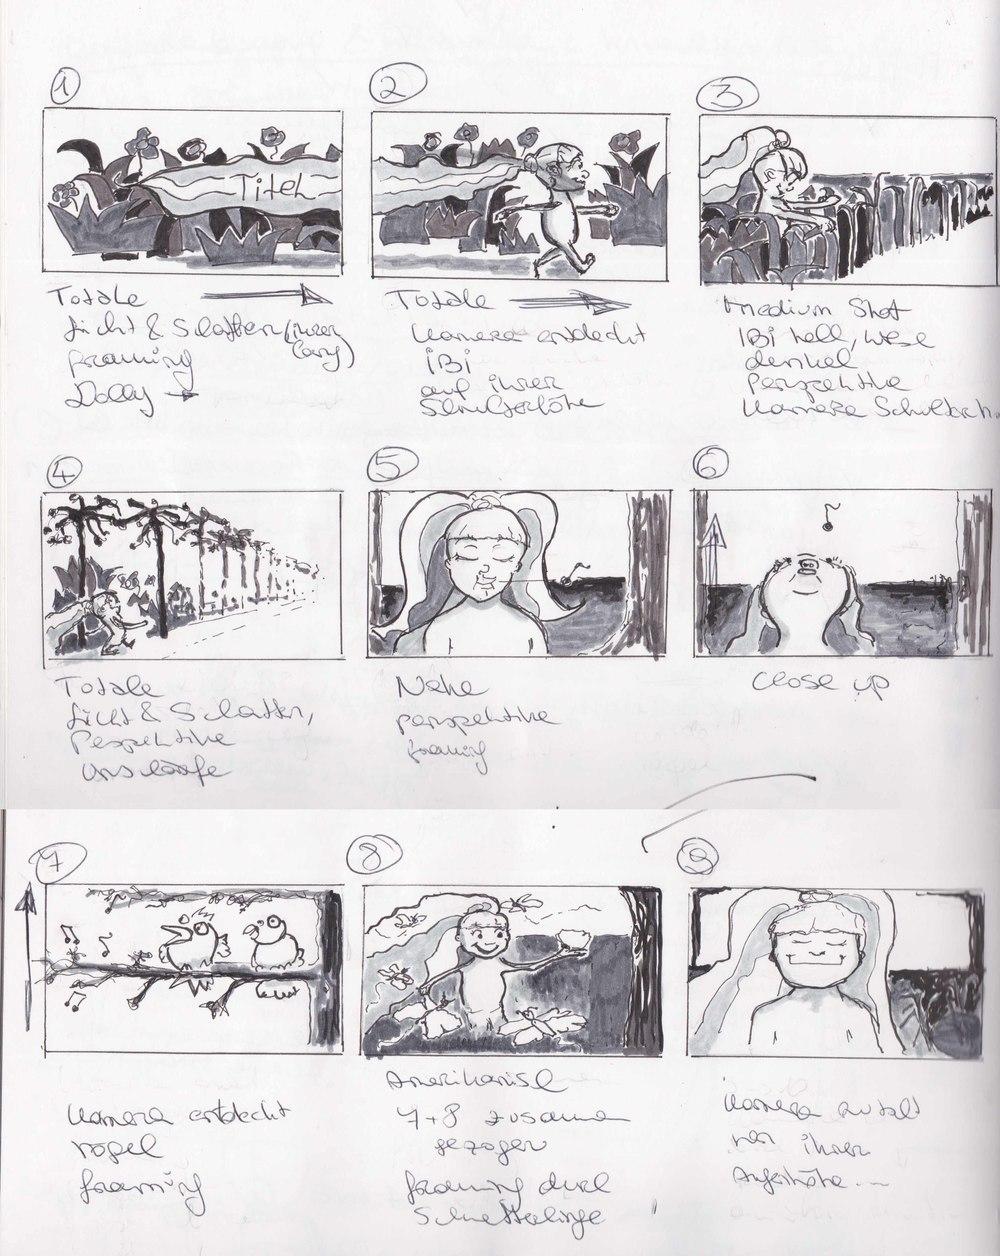 Dollmanits_Storyboard_2_1.jpg